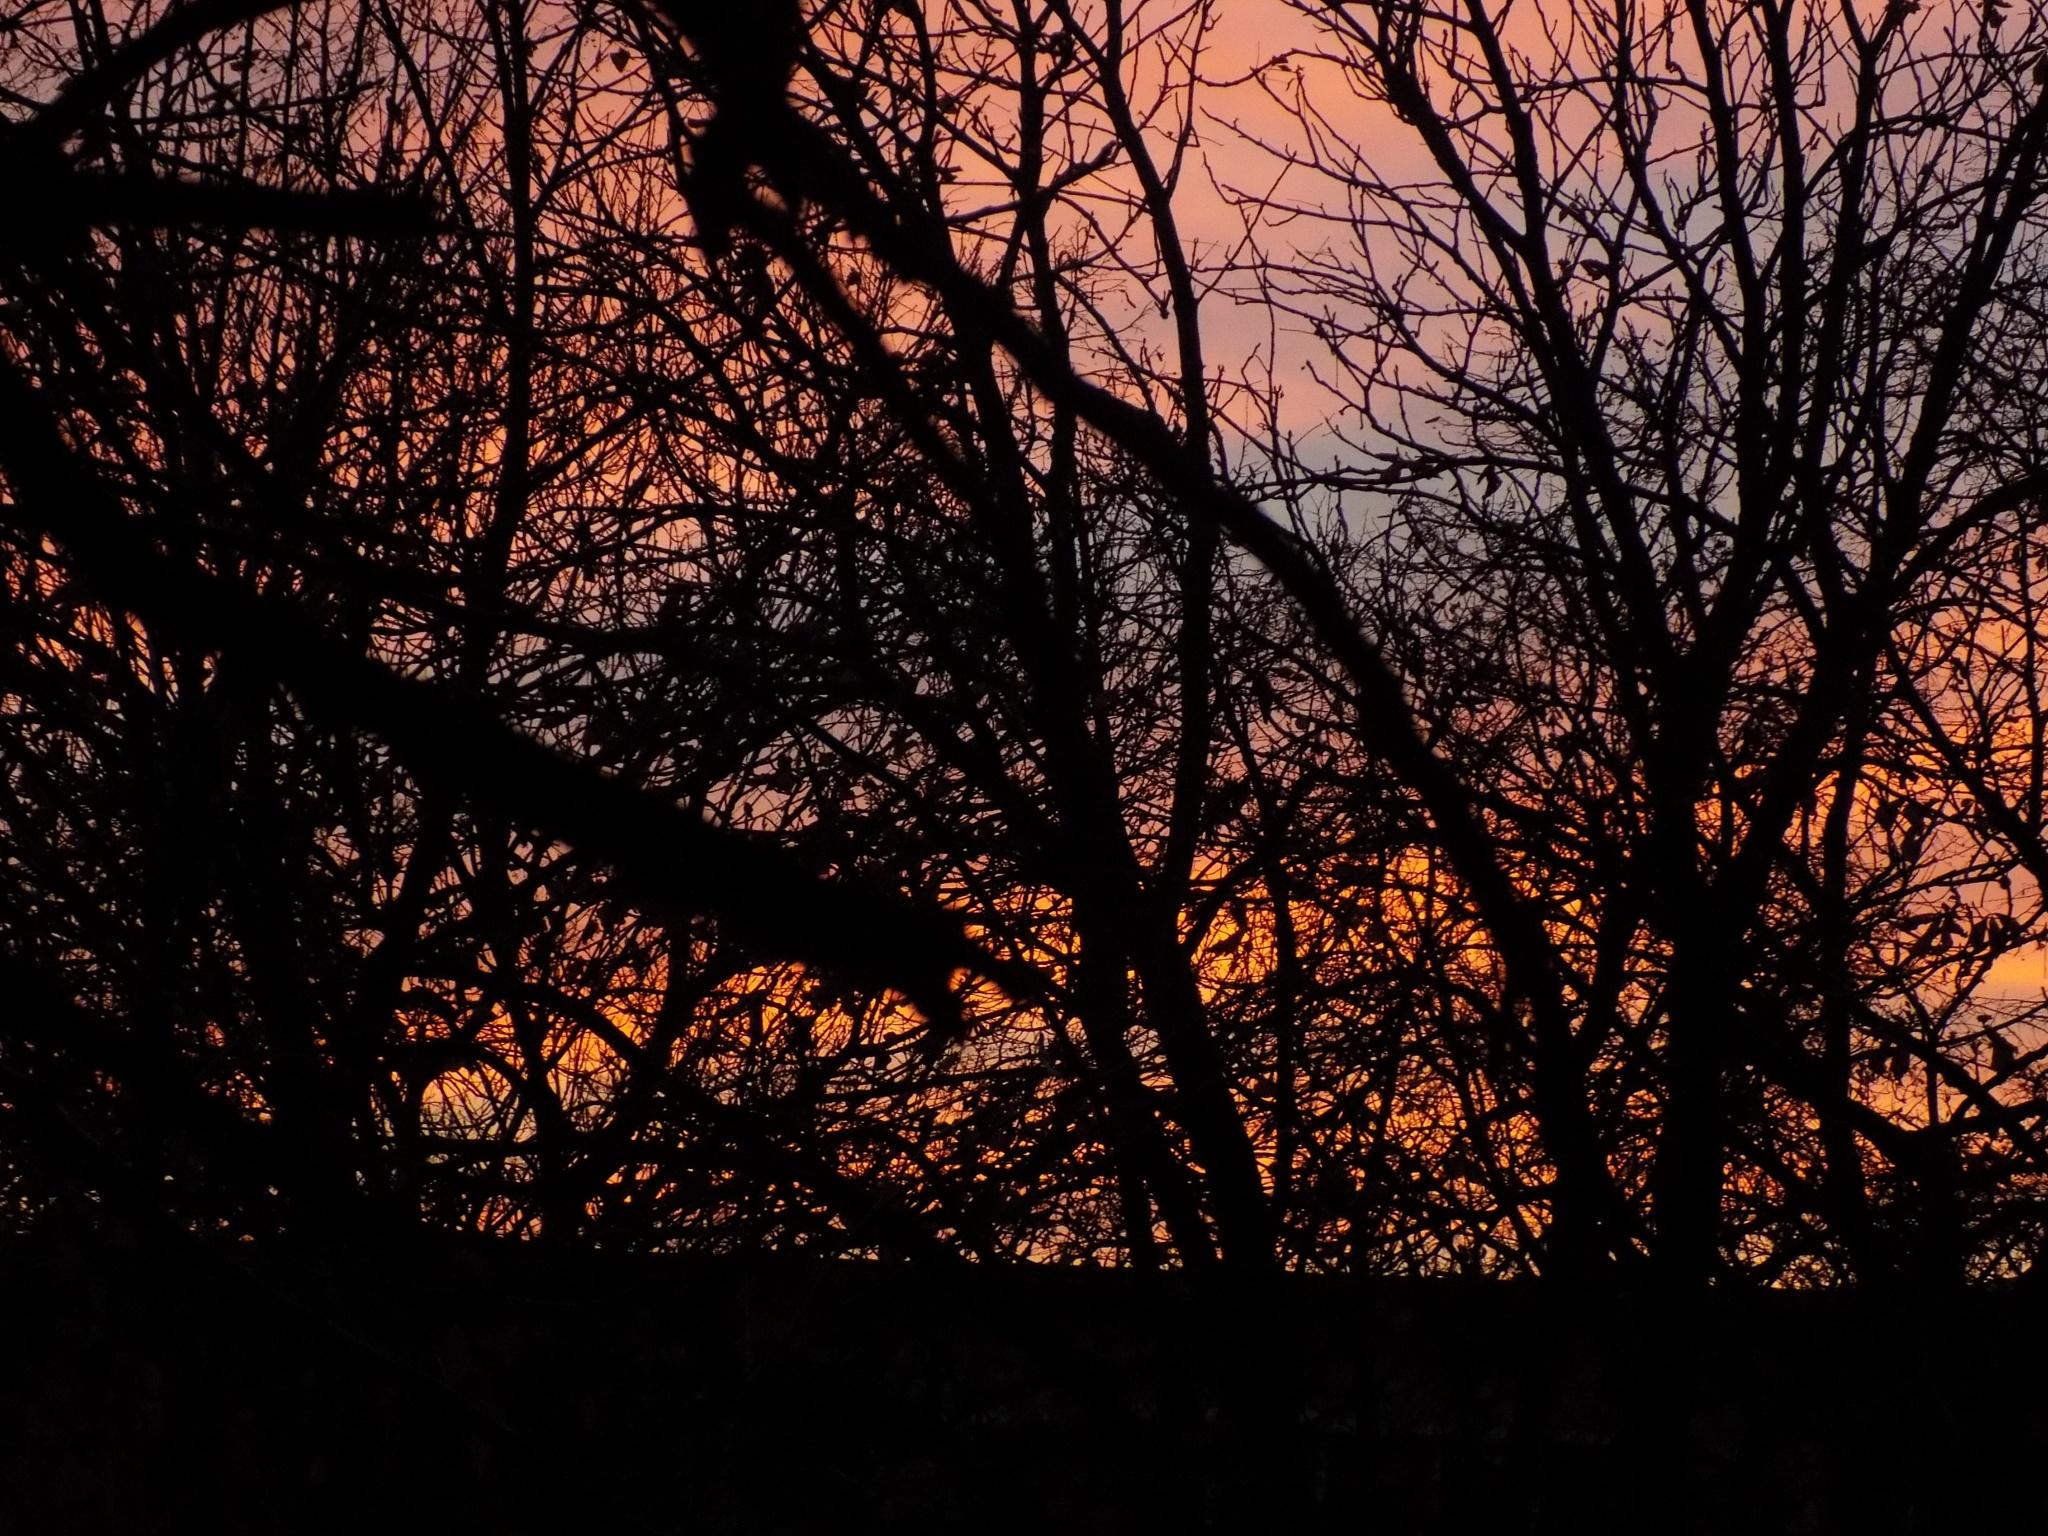 Golden hour by MariusAndreas18